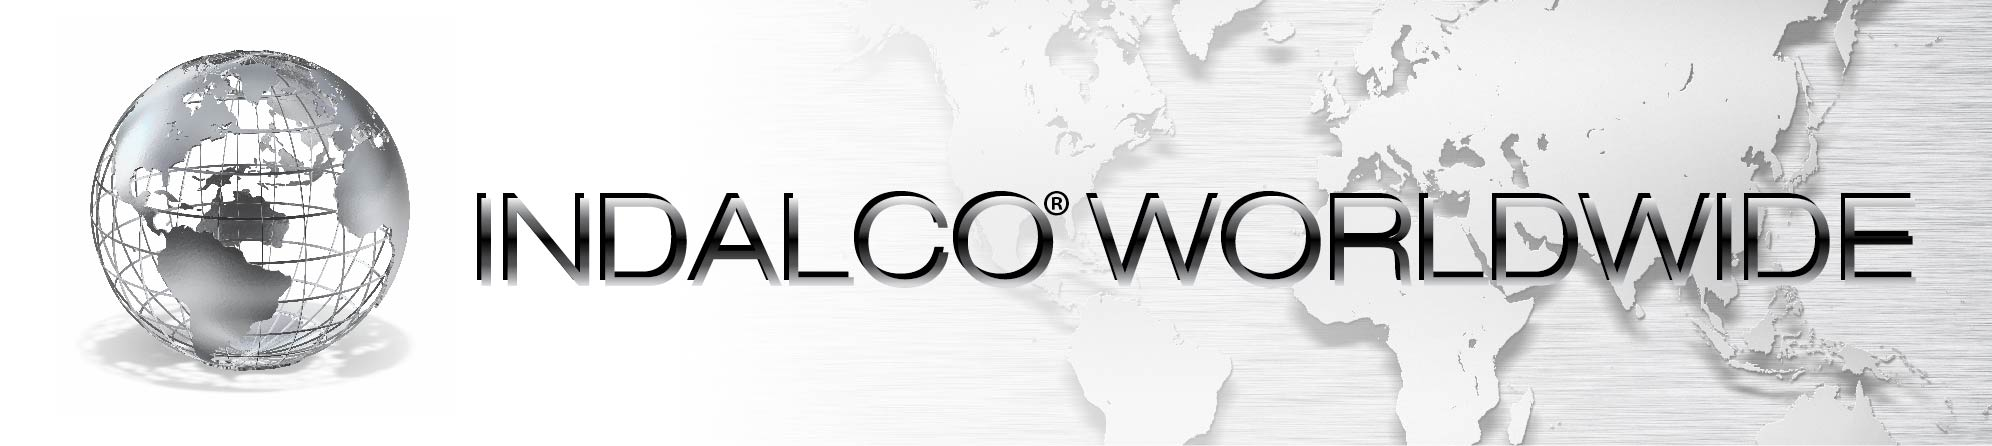 Indalcoworld-01